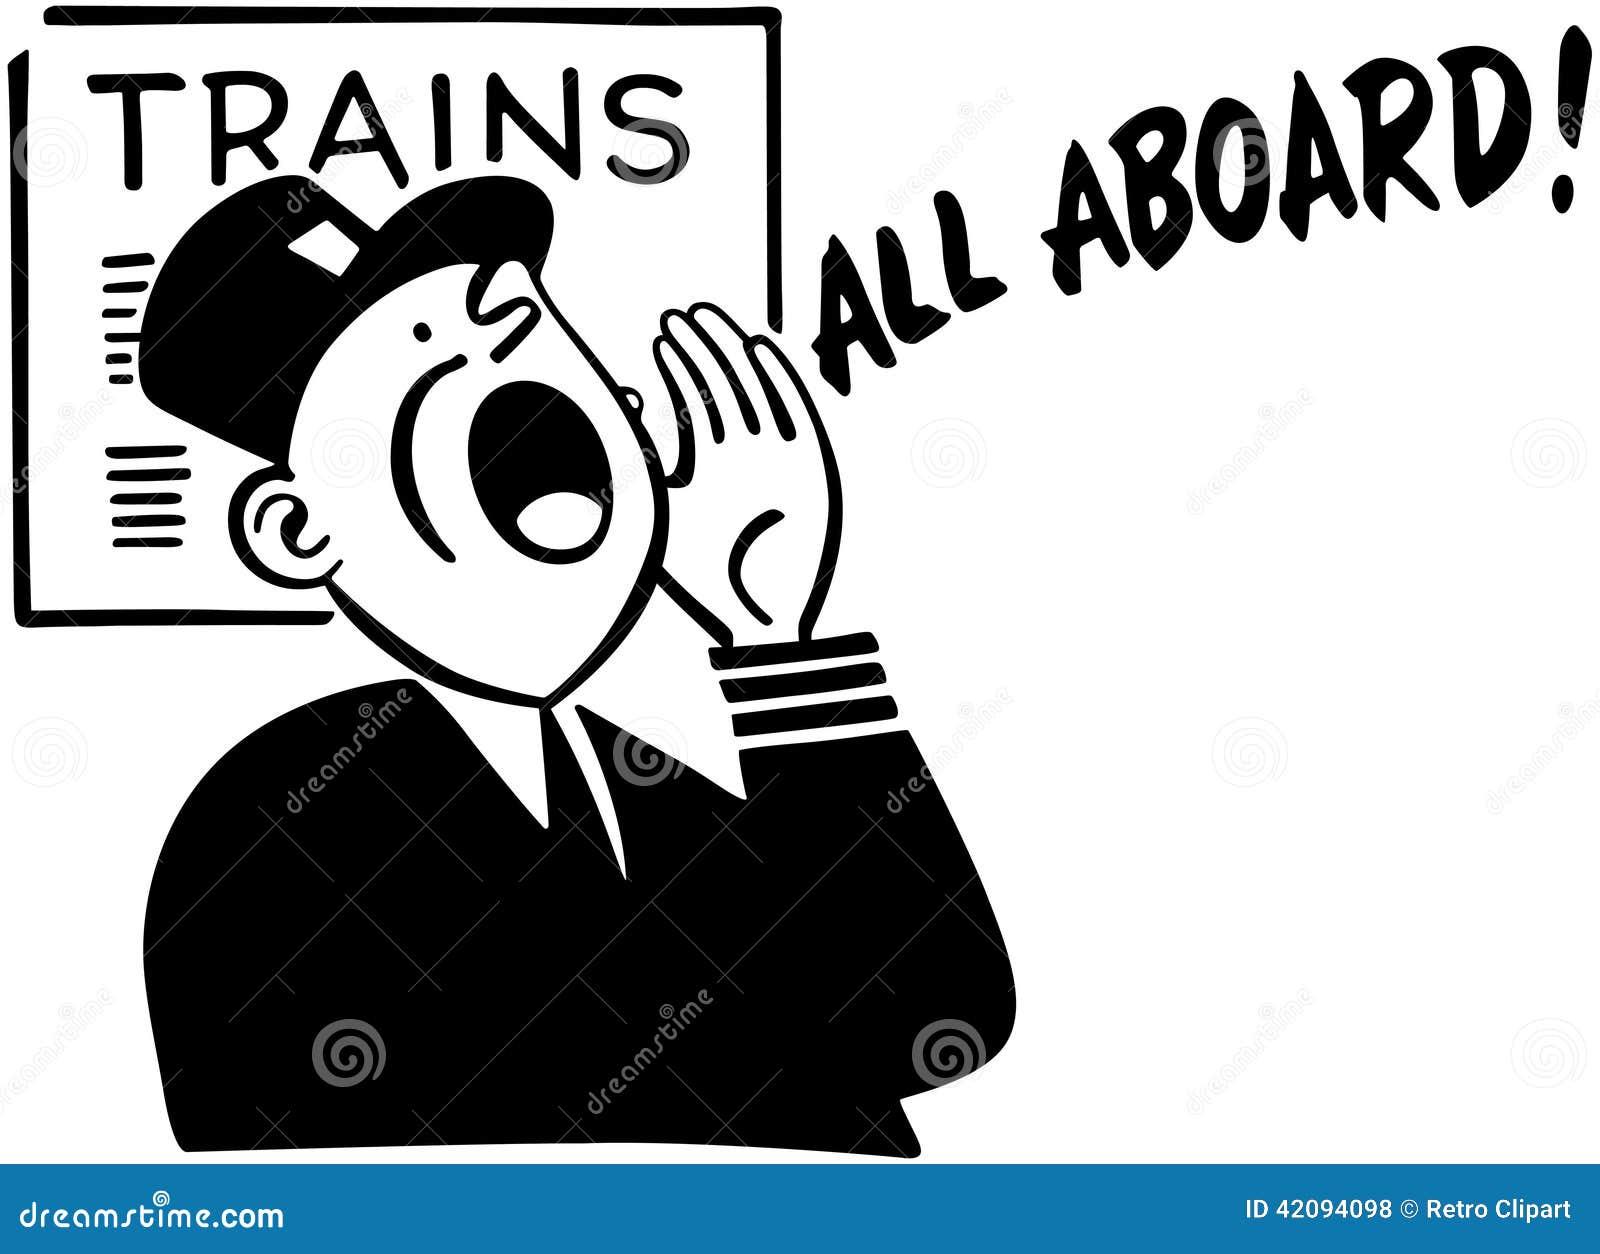 clipart of train conductors - photo #31